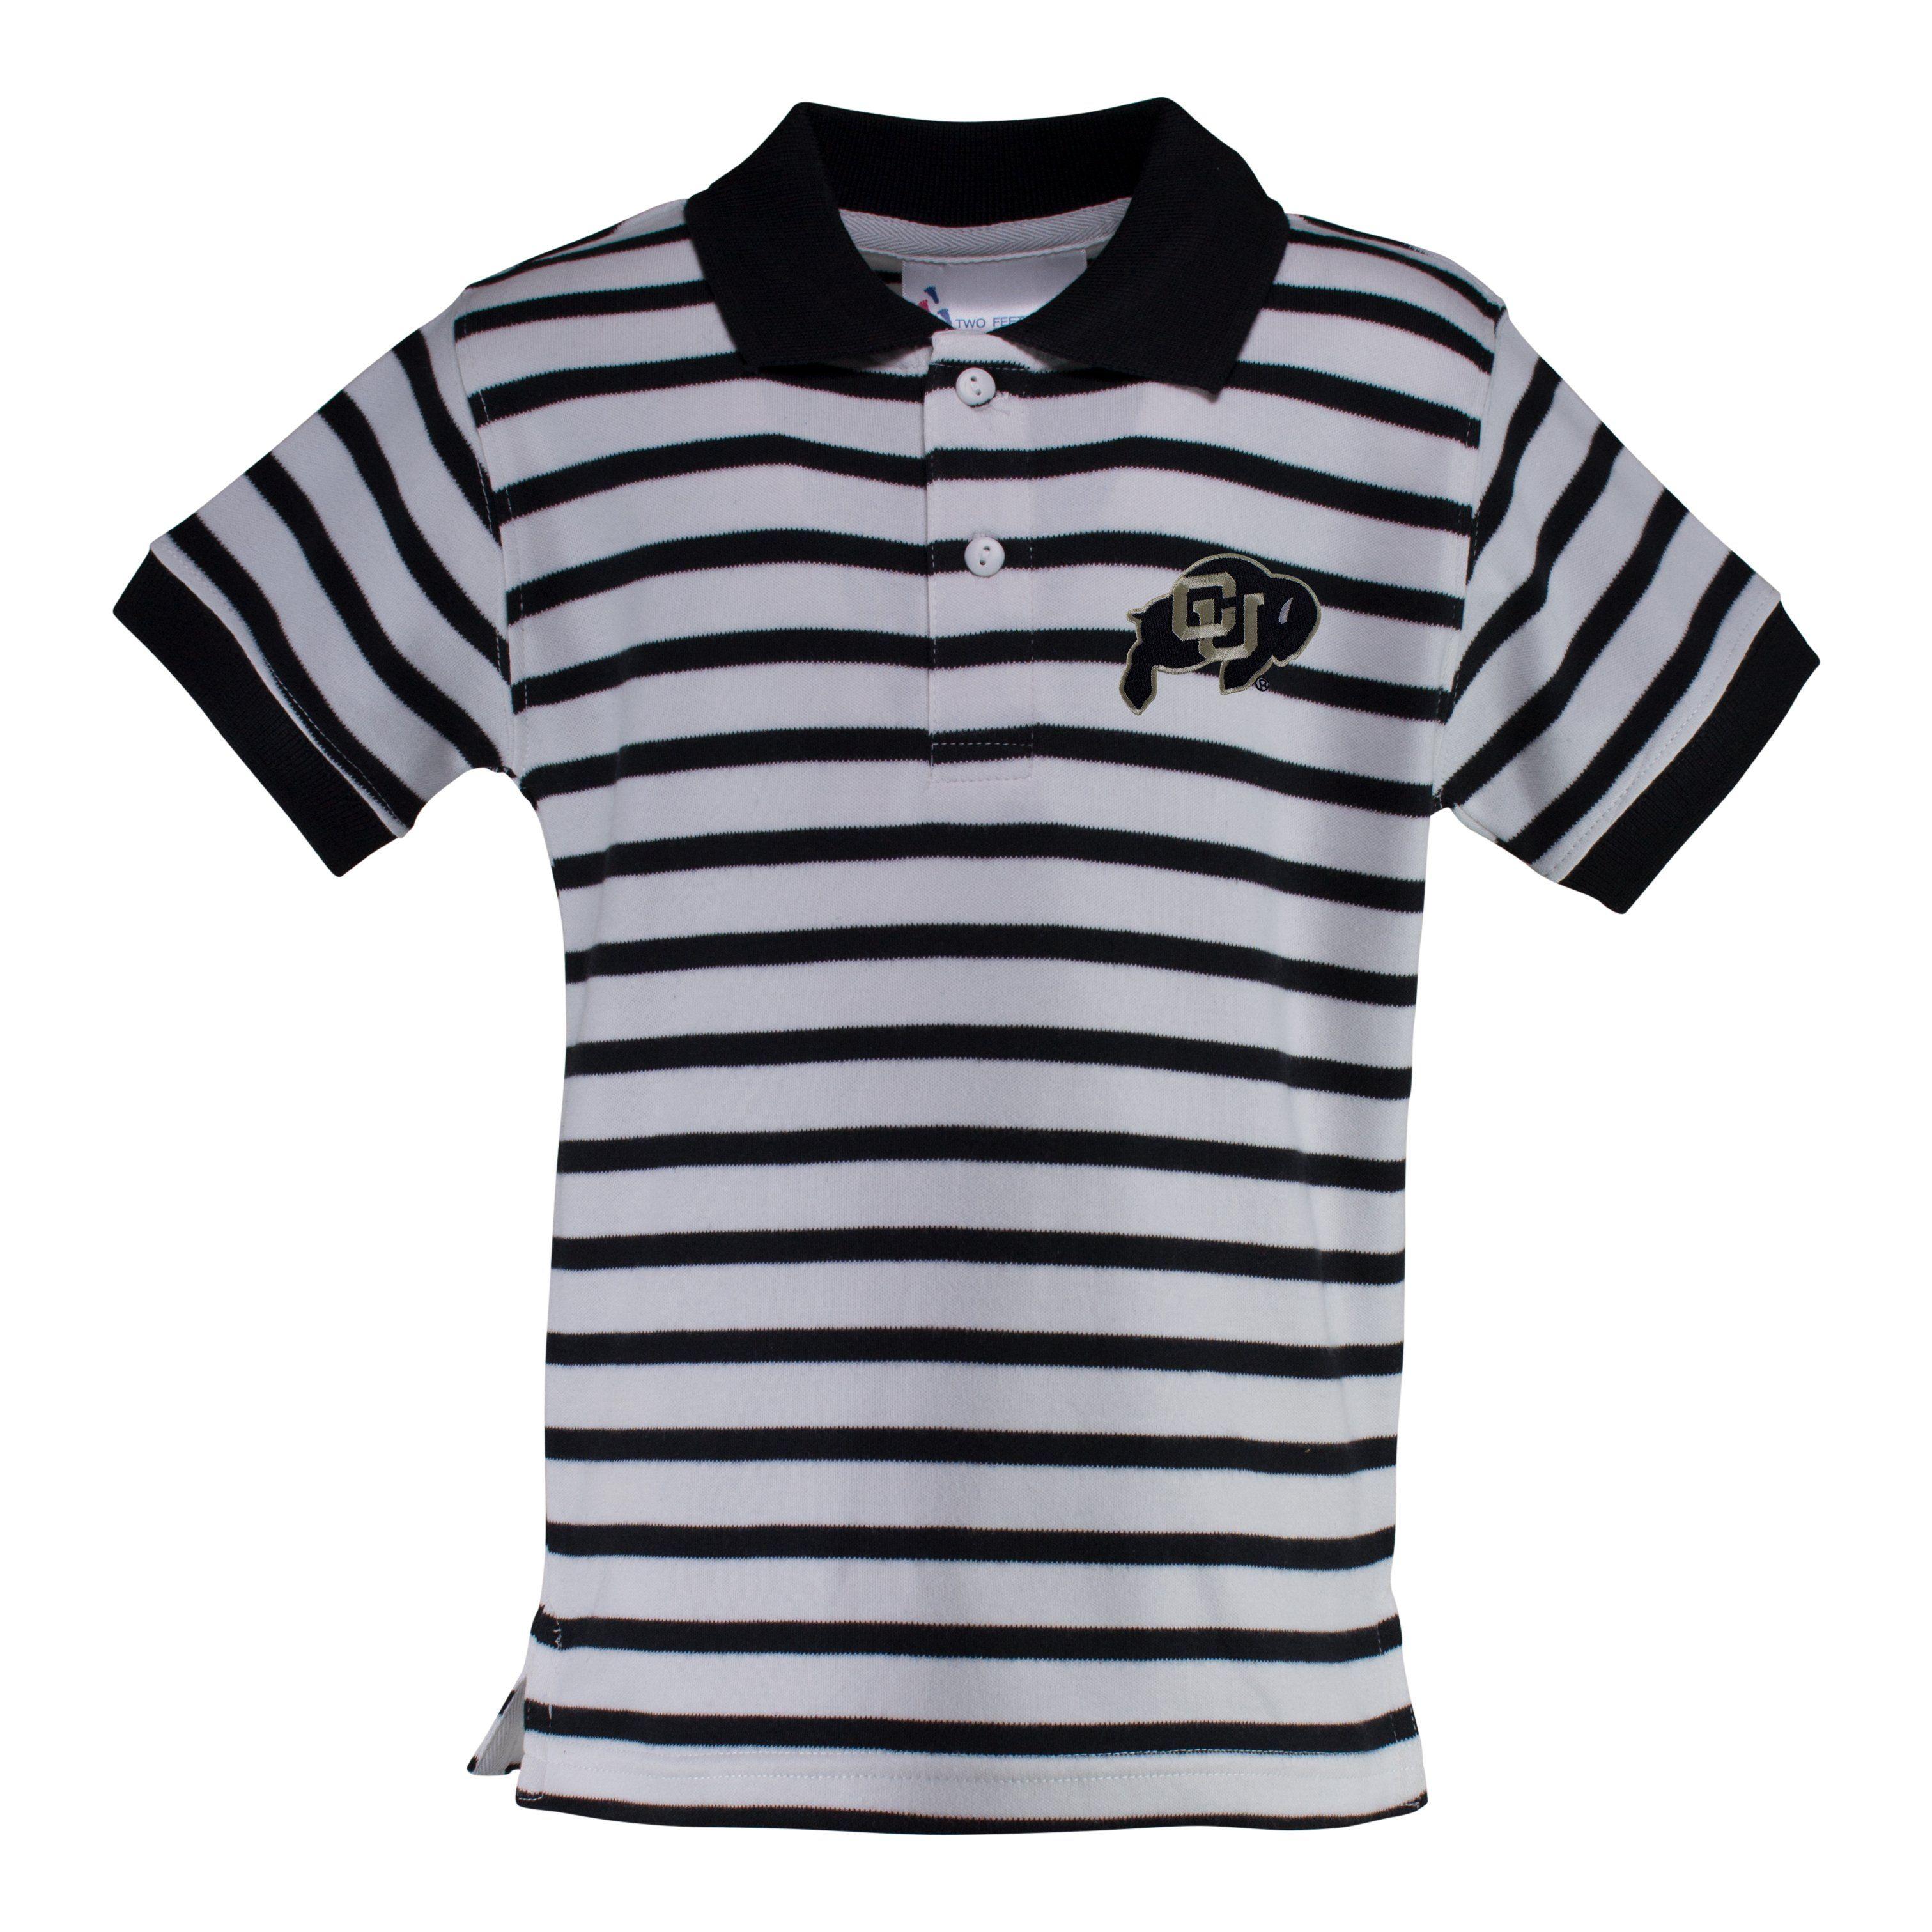 2498d17aaf1 Colorado Stripe Golf Shirt